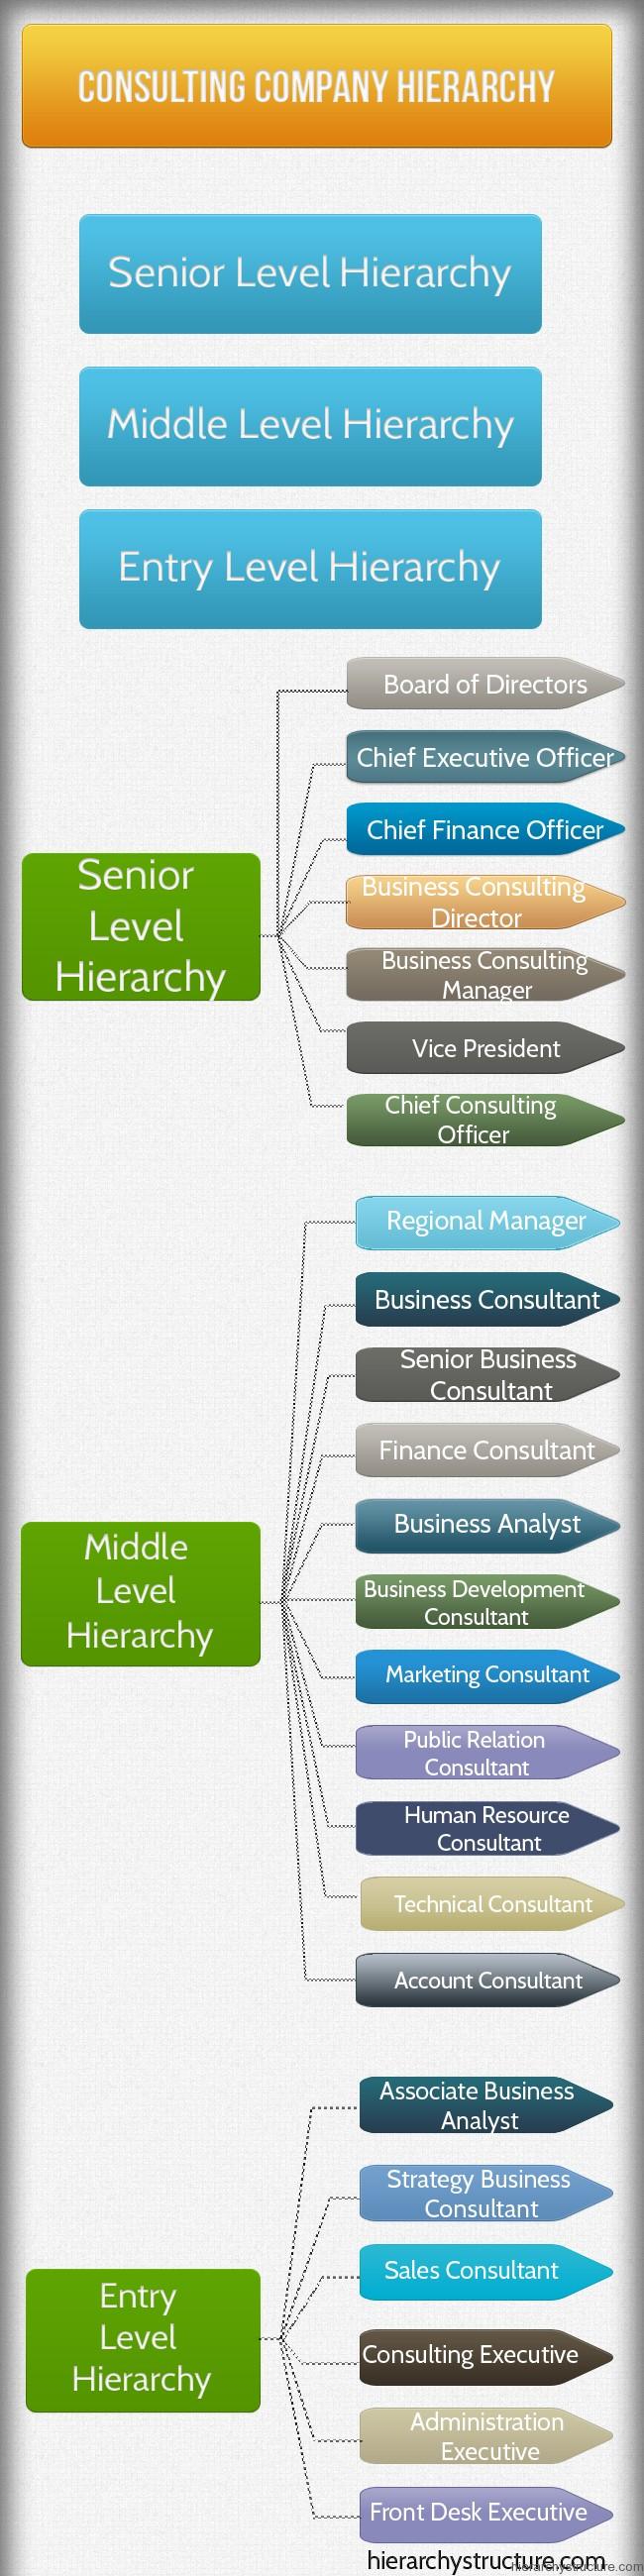 Consulting Company Hierarchy